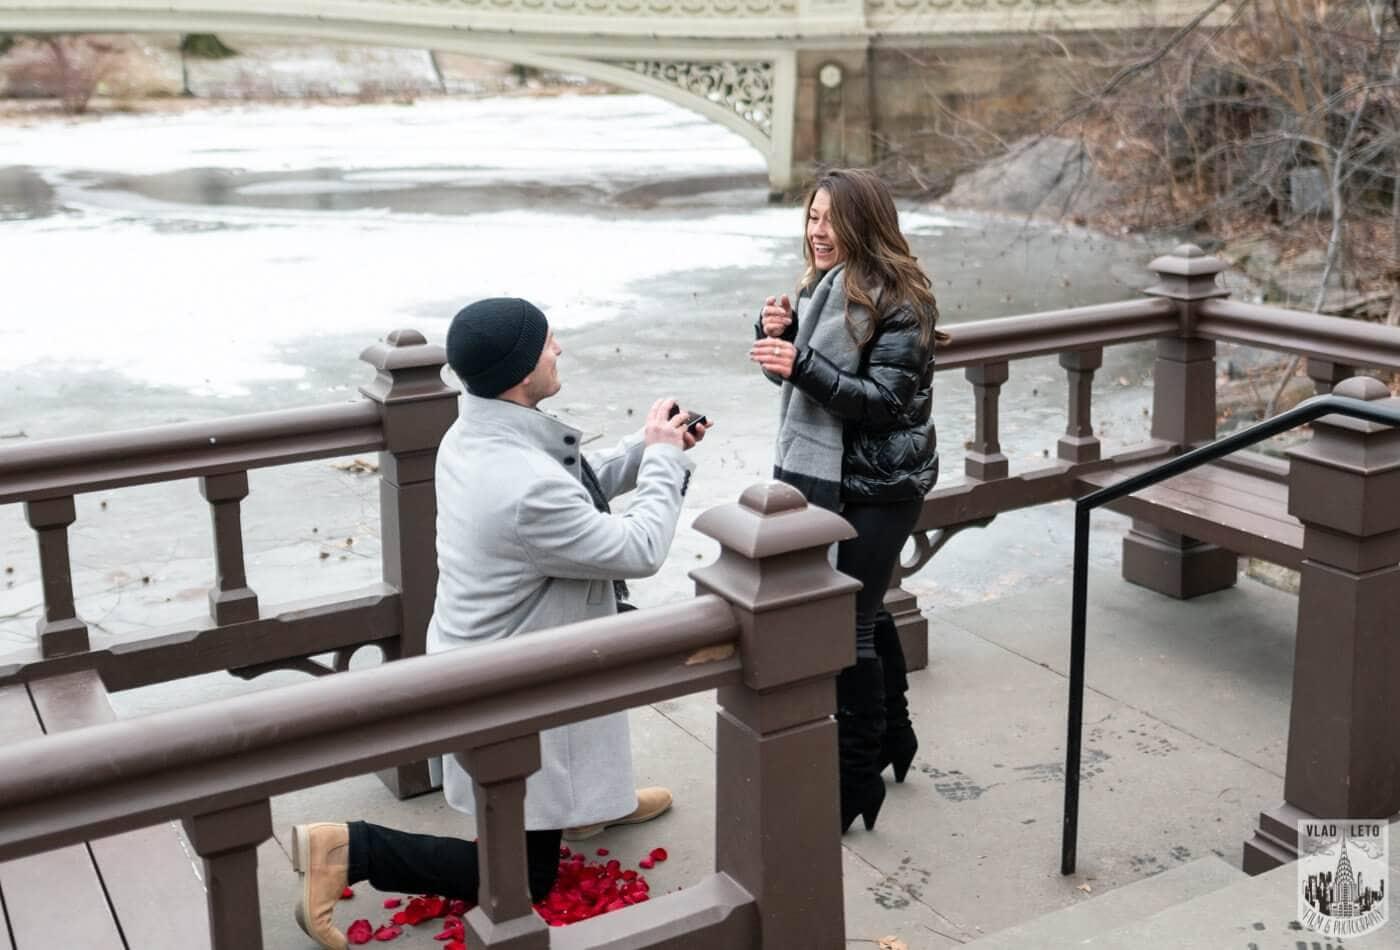 Photo Bow bridge surprise marriage proposal.   VladLeto